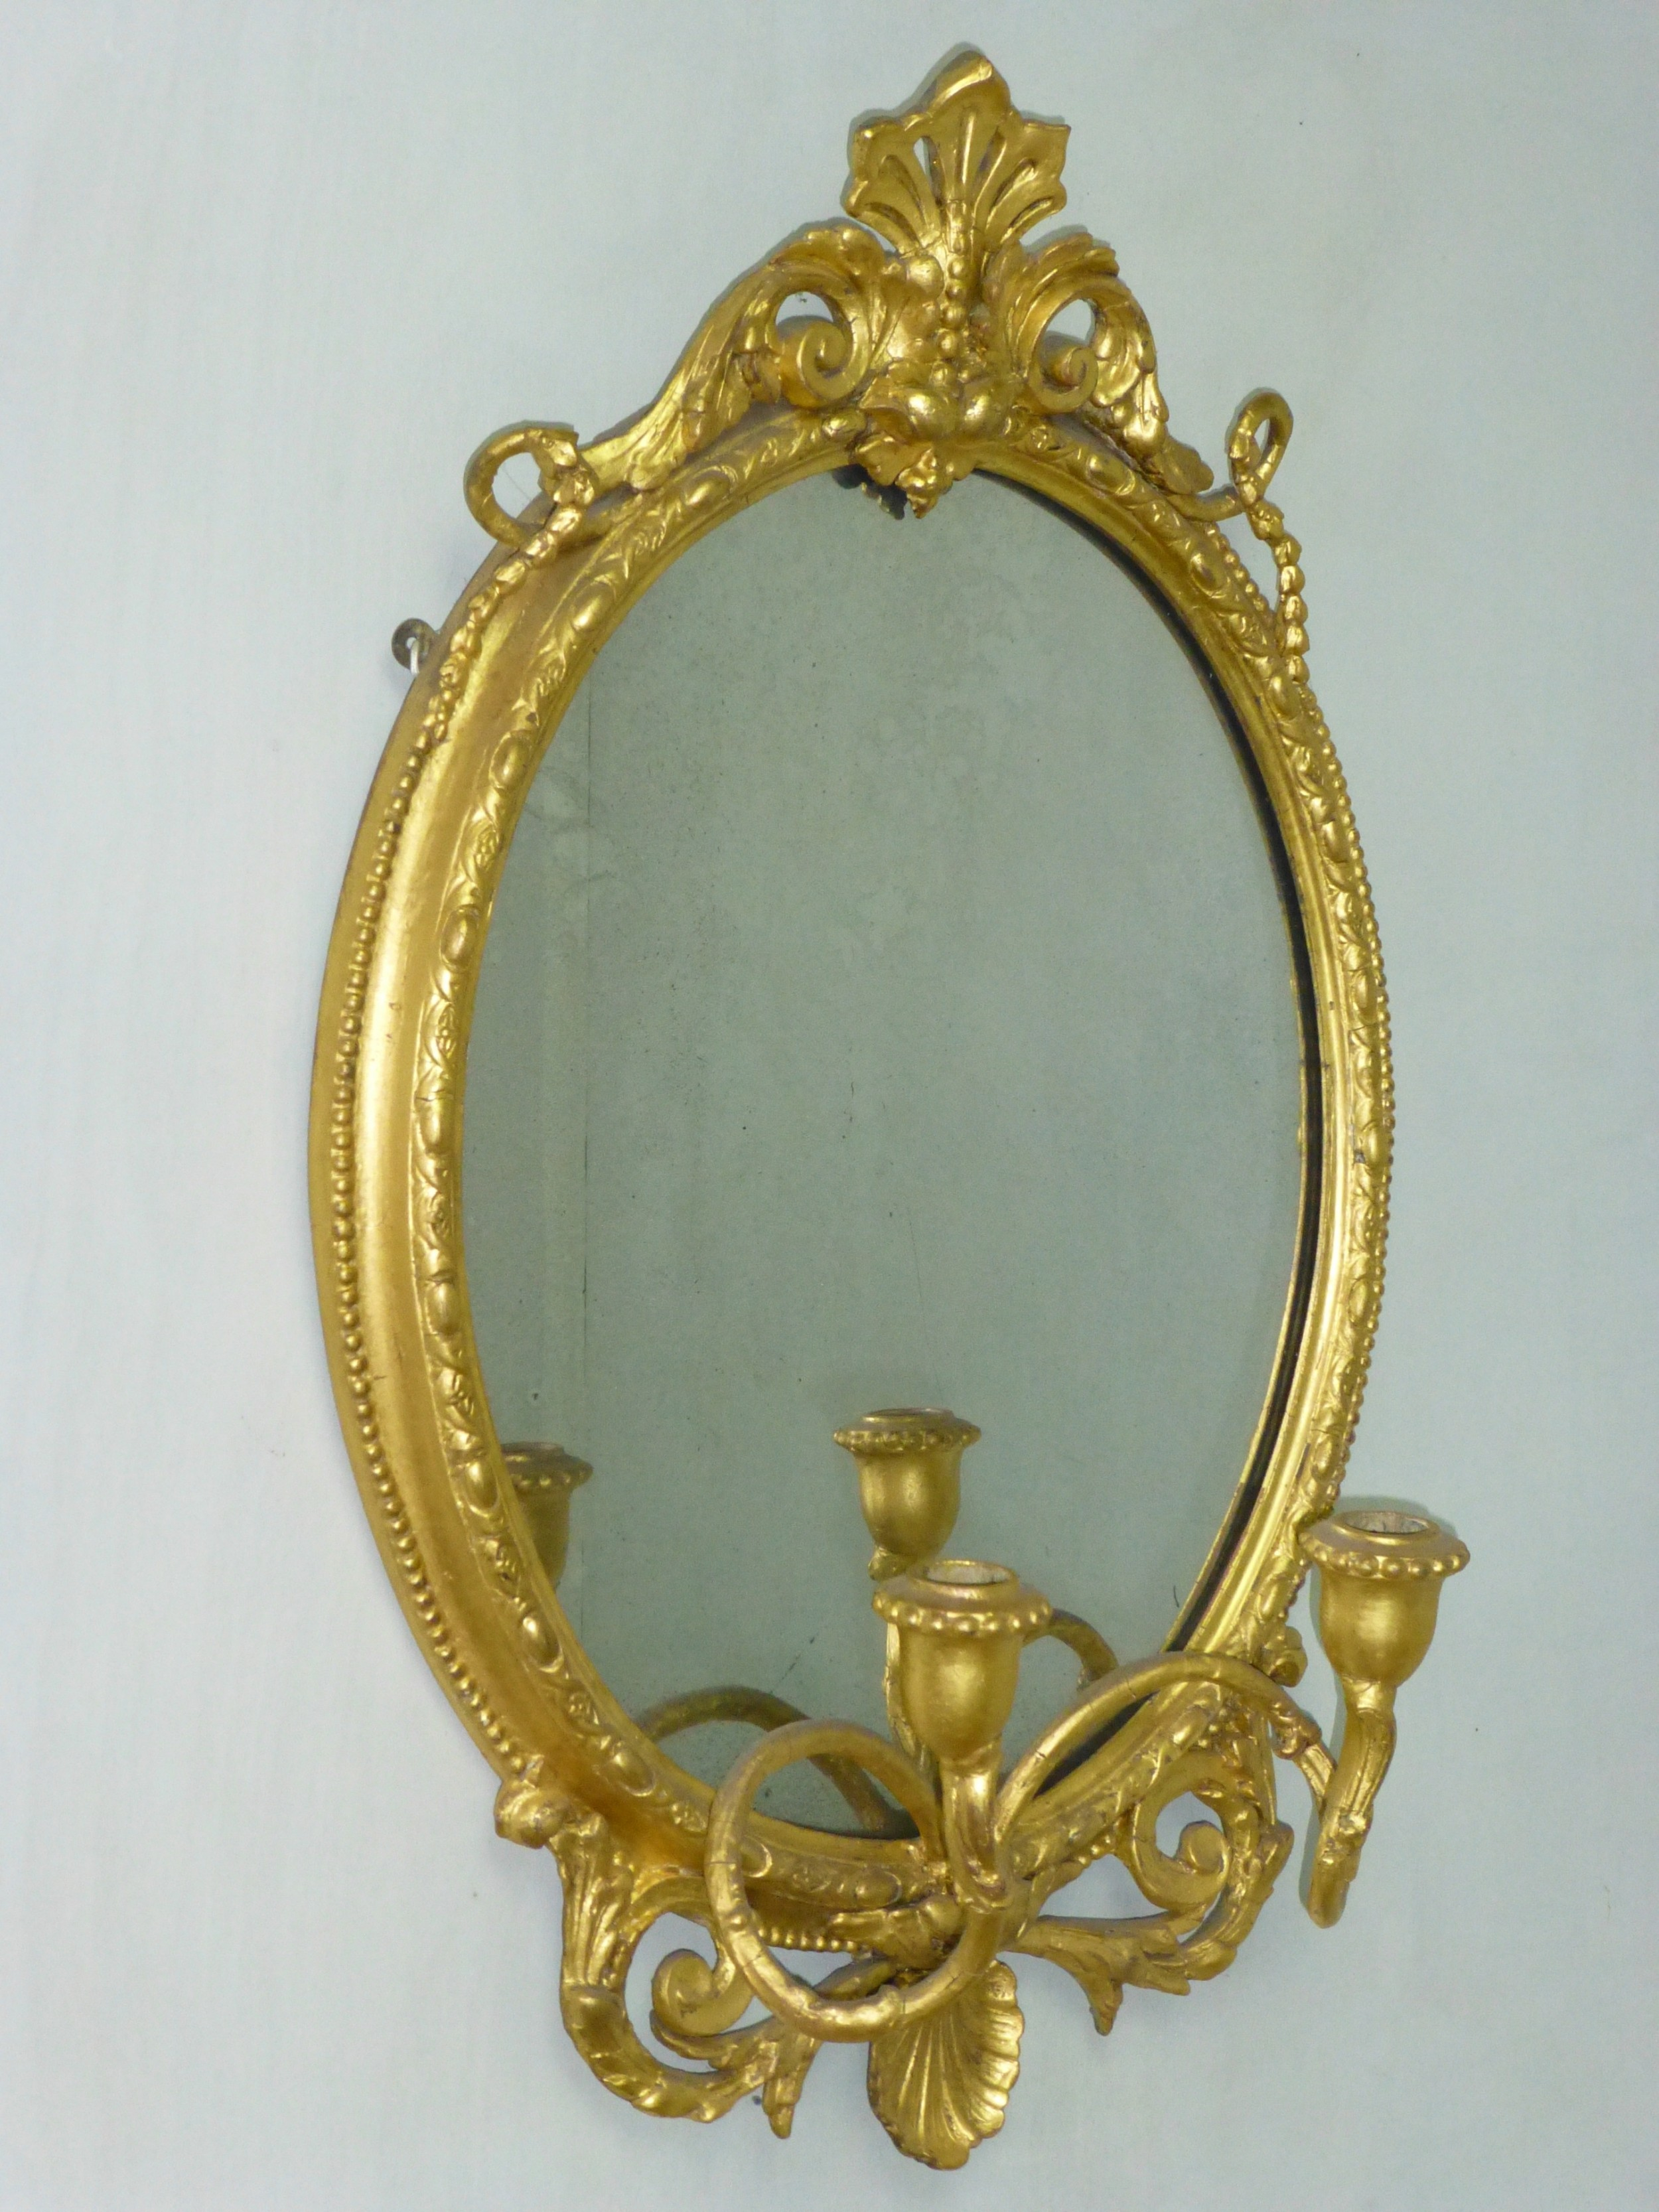 a good quality gilt wood and composition 19th century girandole oval mirror c1860